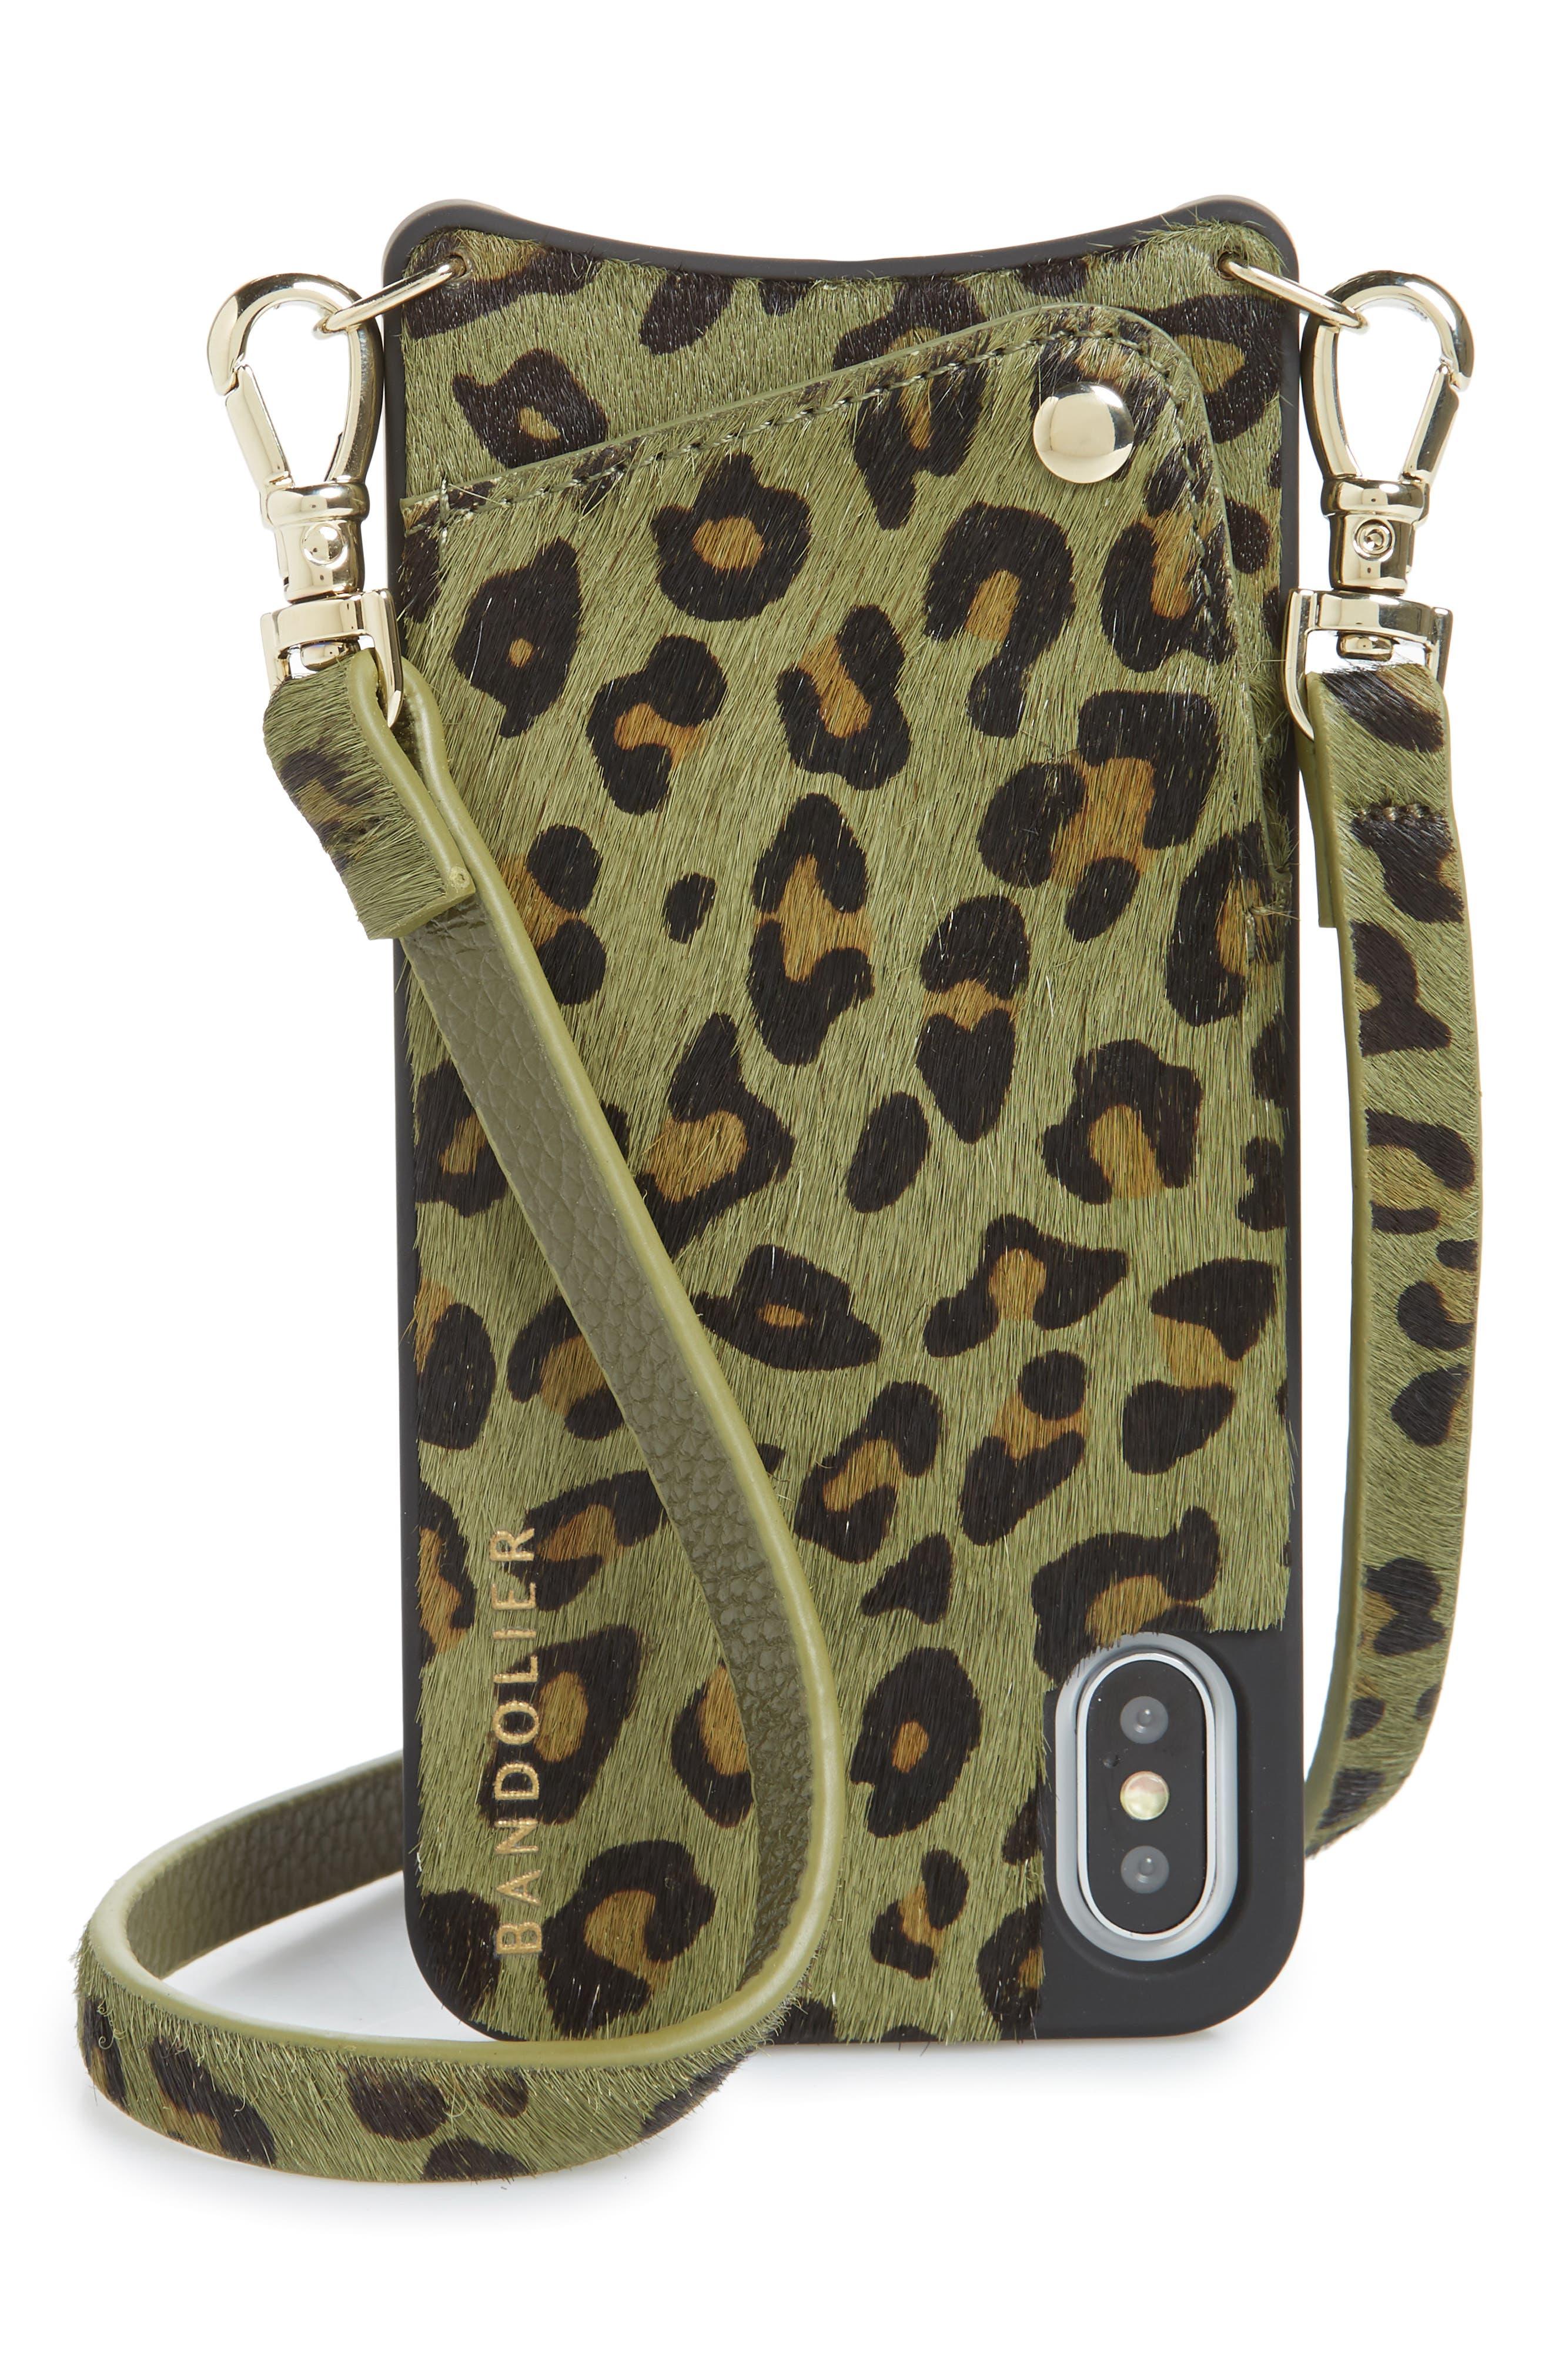 BANDOLIER,                             Emma Genuine Calf Hair iPhone X/Xs/Xs Max & XR Crossbody Case,                             Main thumbnail 1, color,                             GREEN/ GOLD